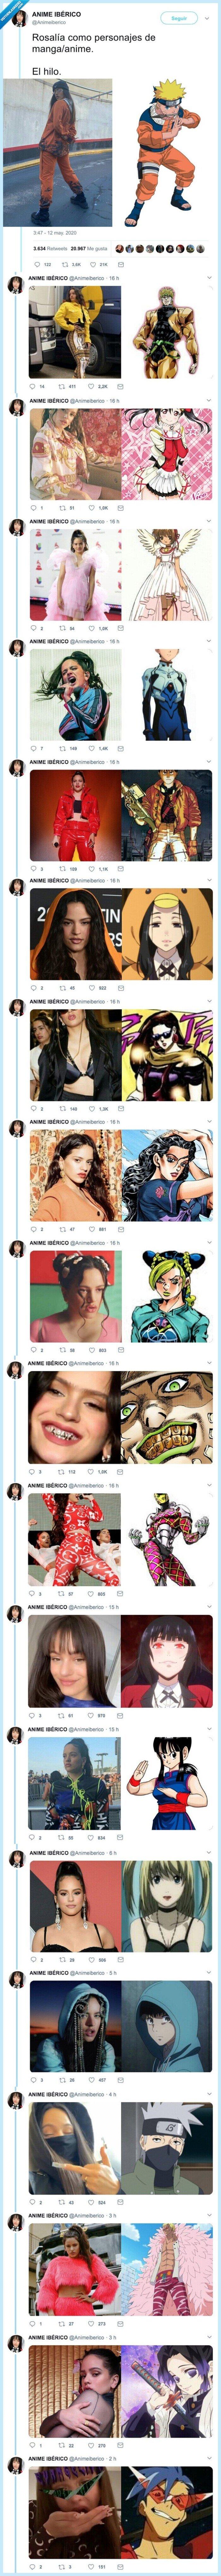 anime,personajes,rosalía